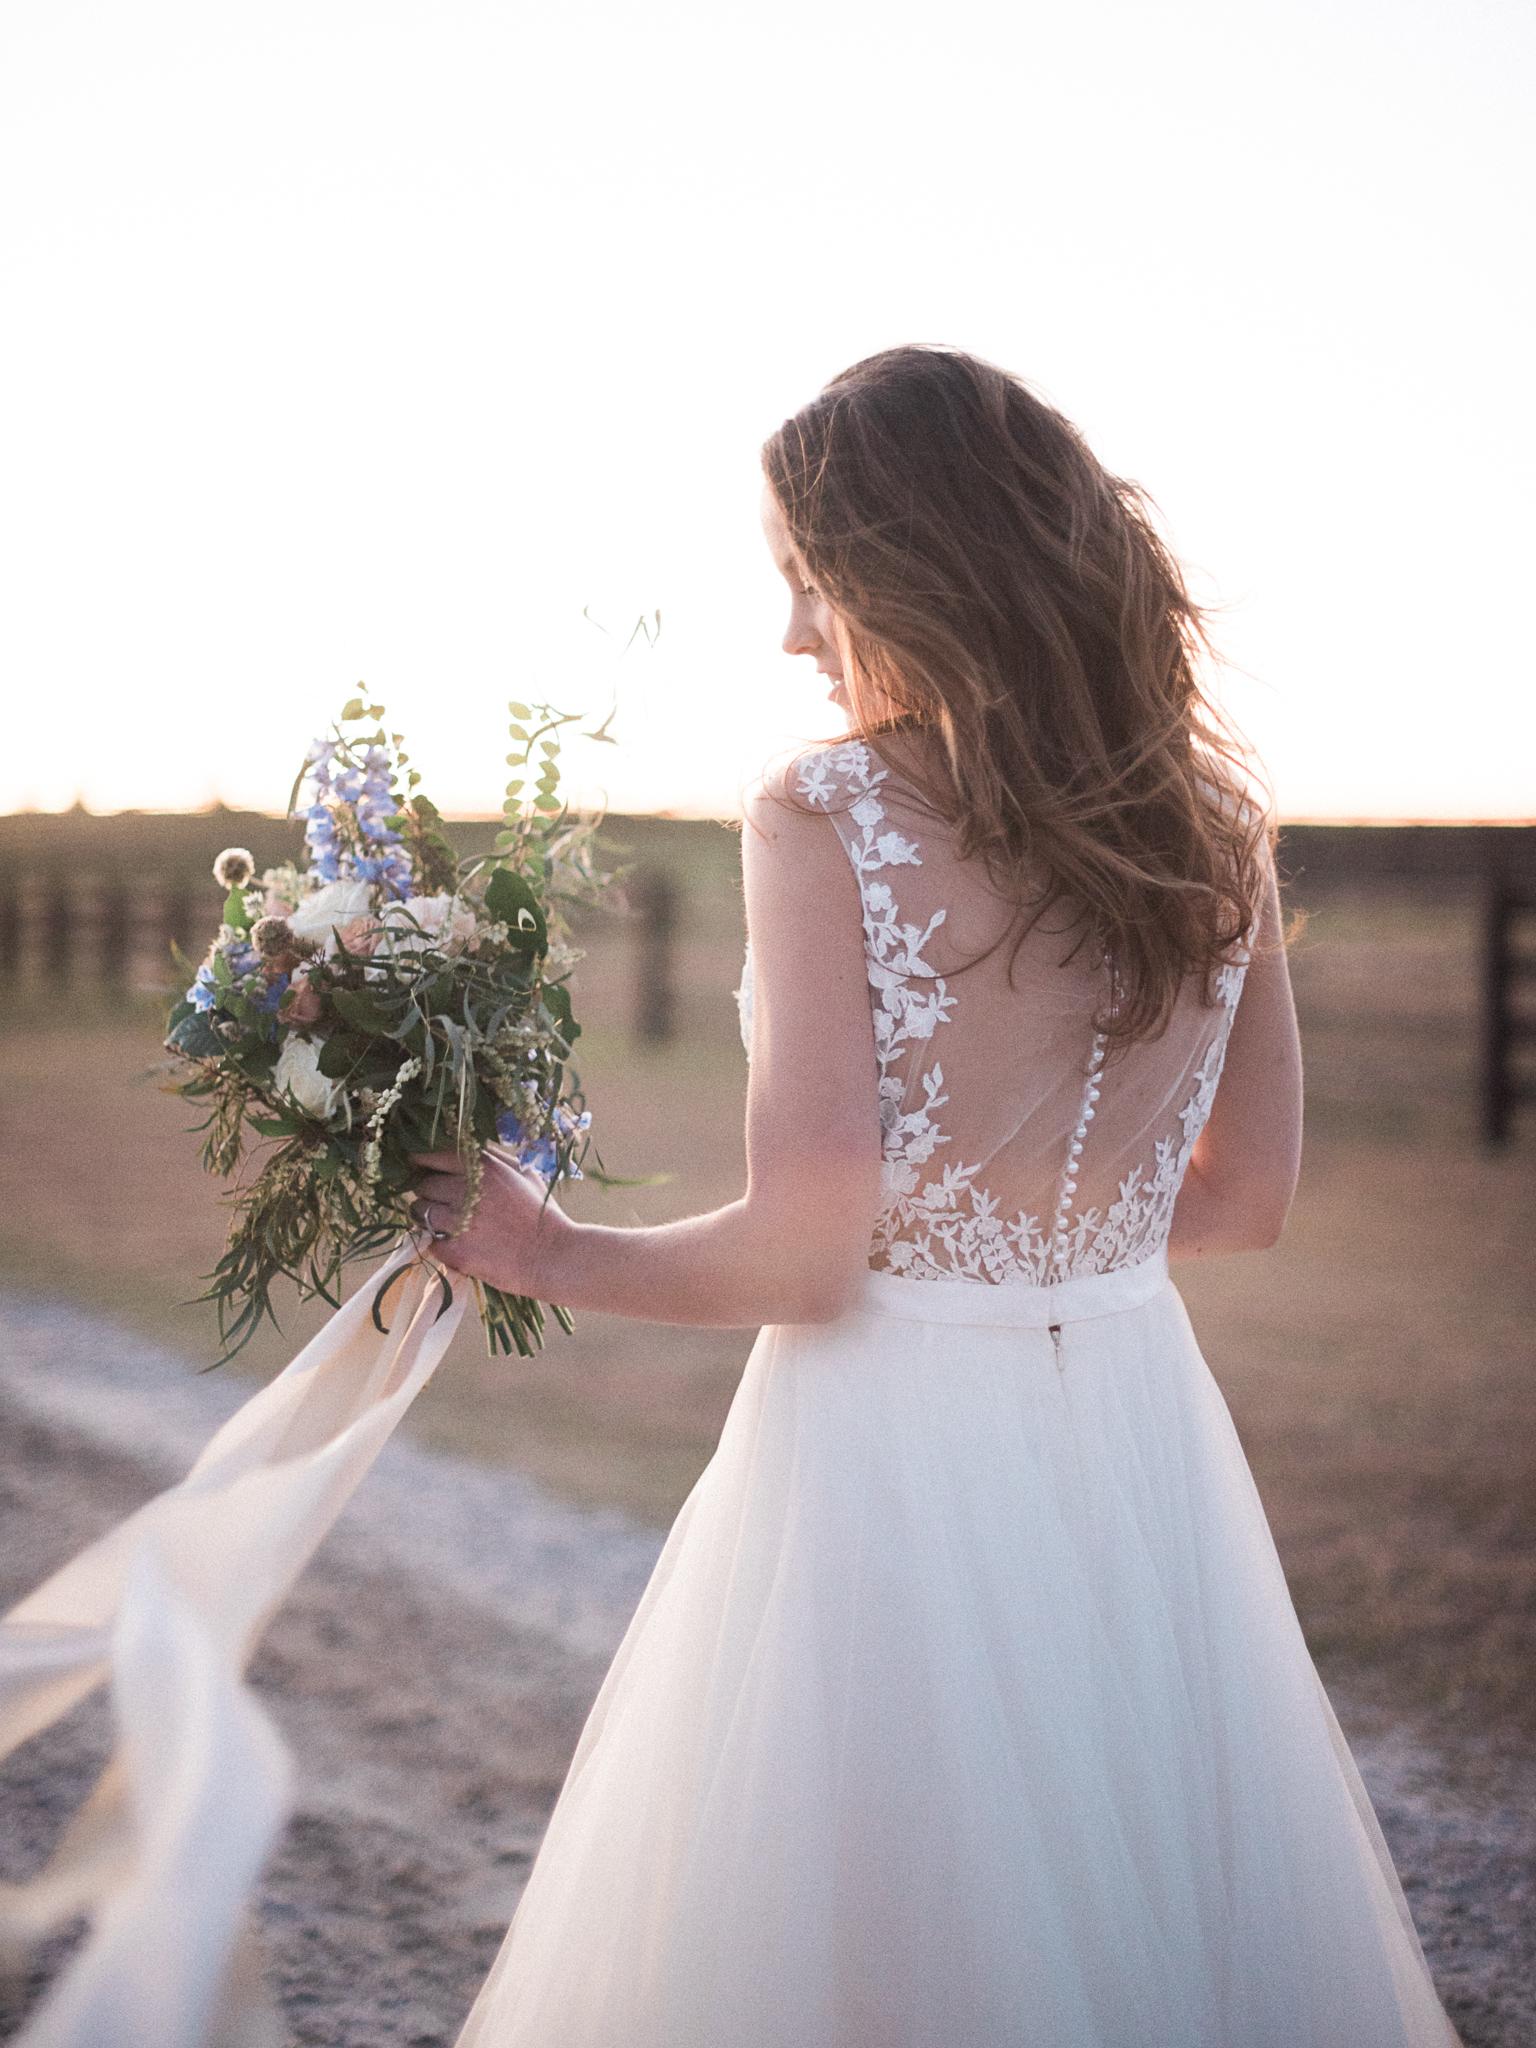 christinadavis+weddinginspiration02.jpg